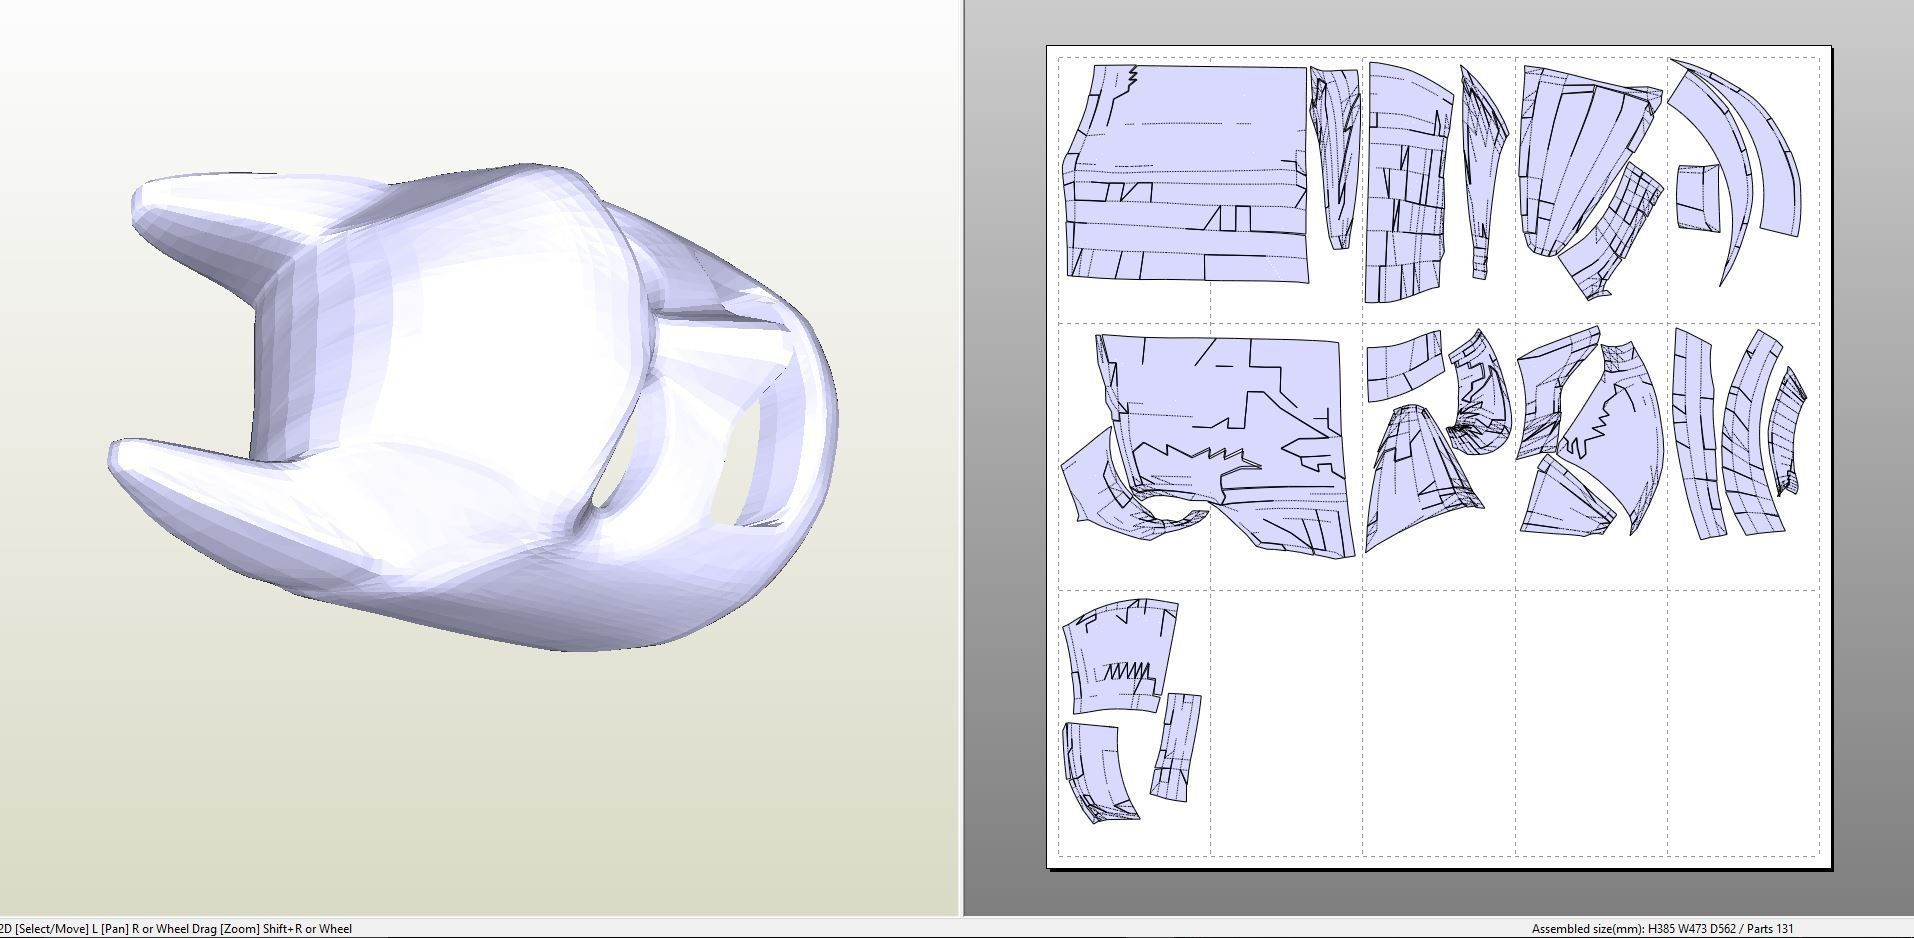 Sword Papercraft Papercraft Pdo File Template for Lego Batman Cowl Foam